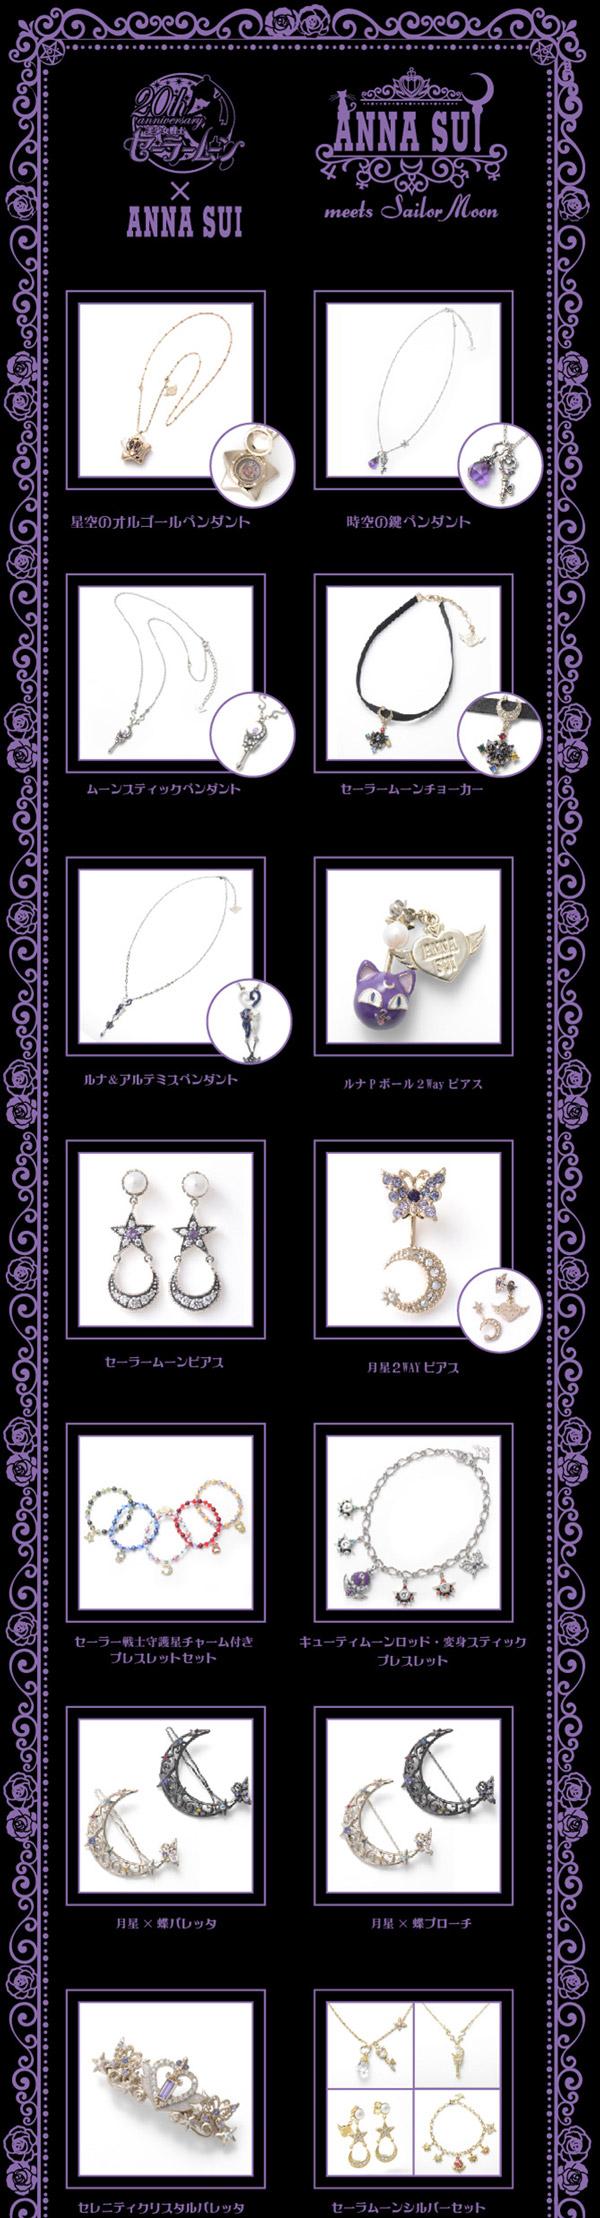 sailormoon-anna-sui-isetan-collaboration-jewelry-bags2016-1sm